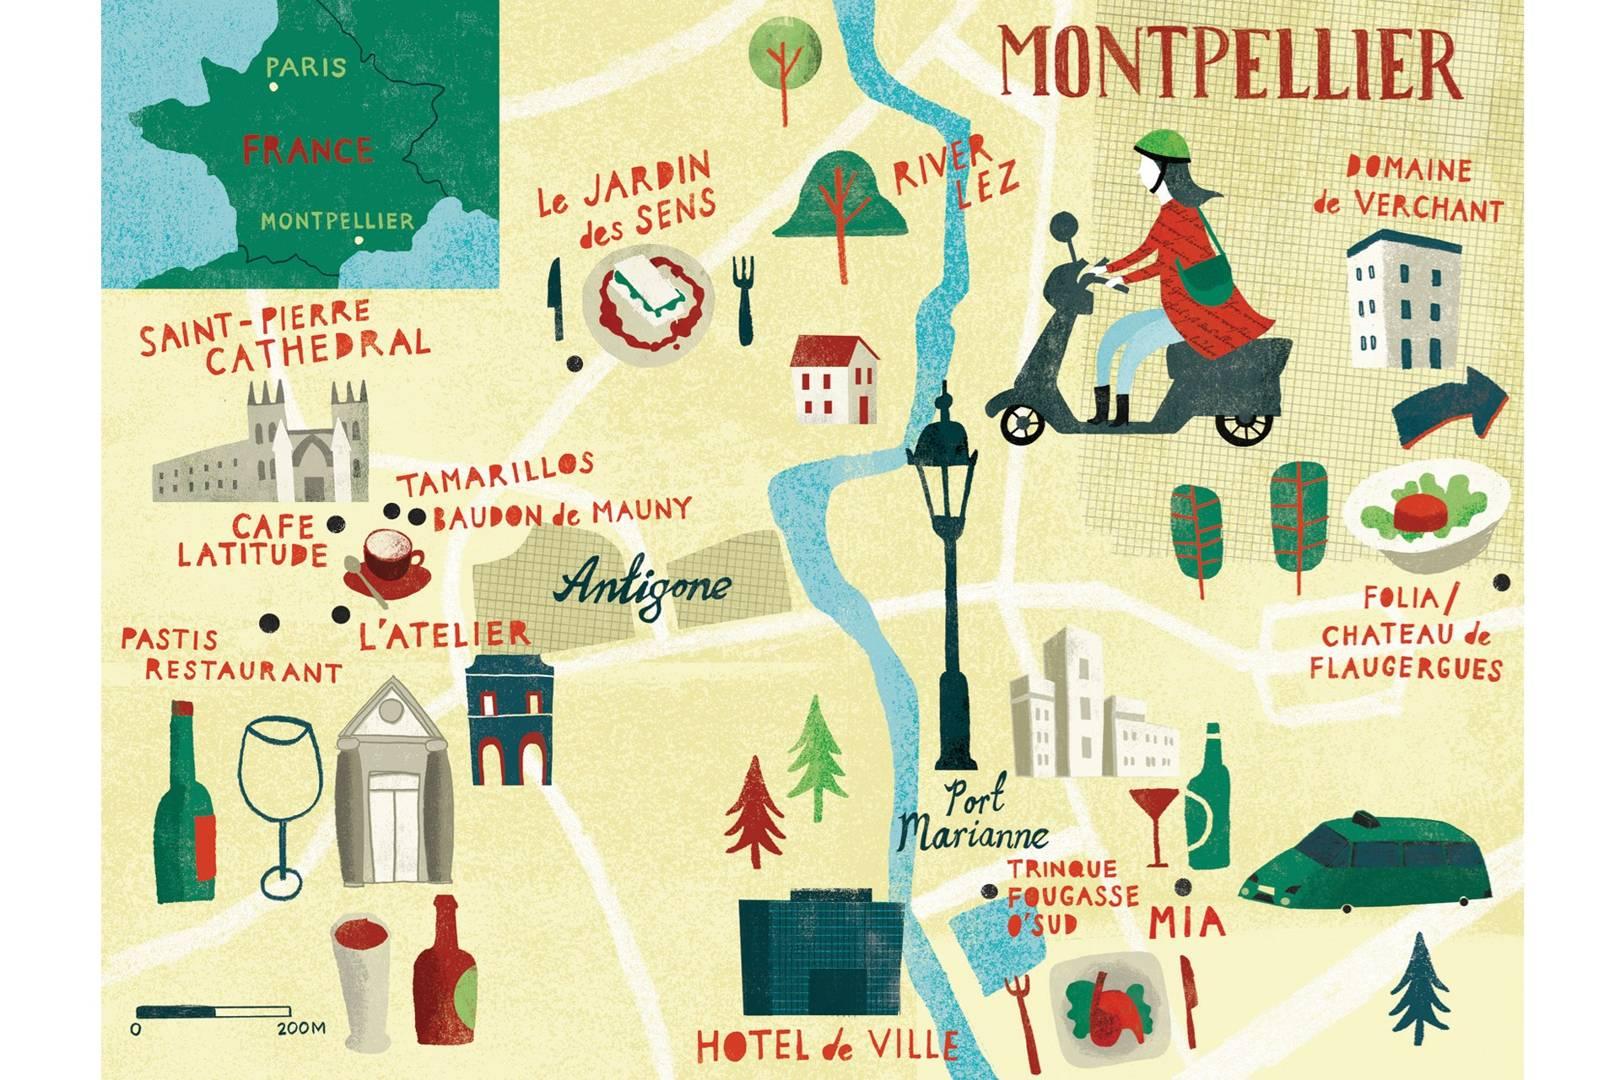 montpellier france map conde nast traveller 20may14 gary venn